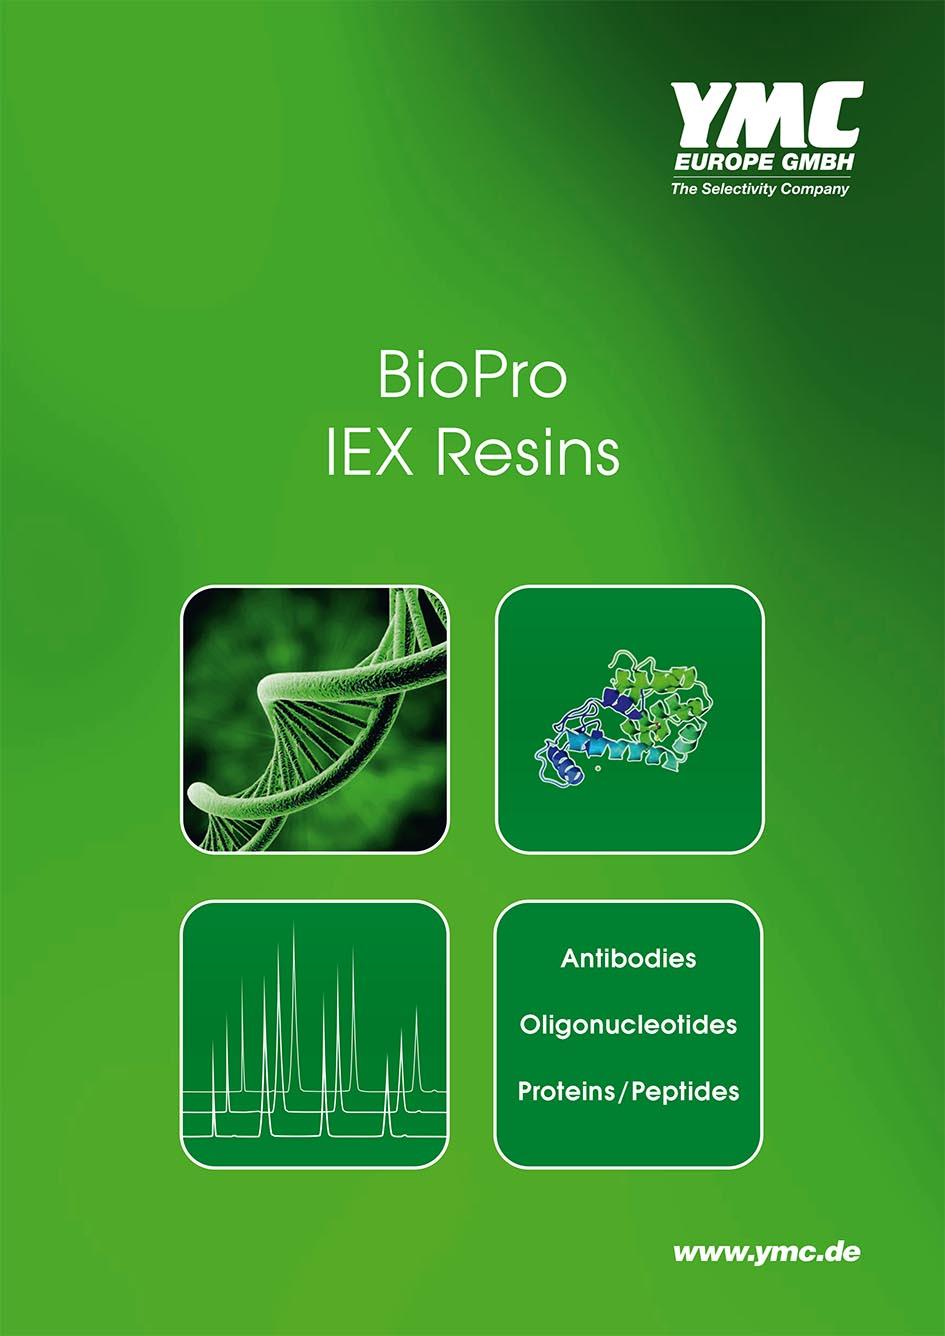 YMC - BioPro IEX Resins